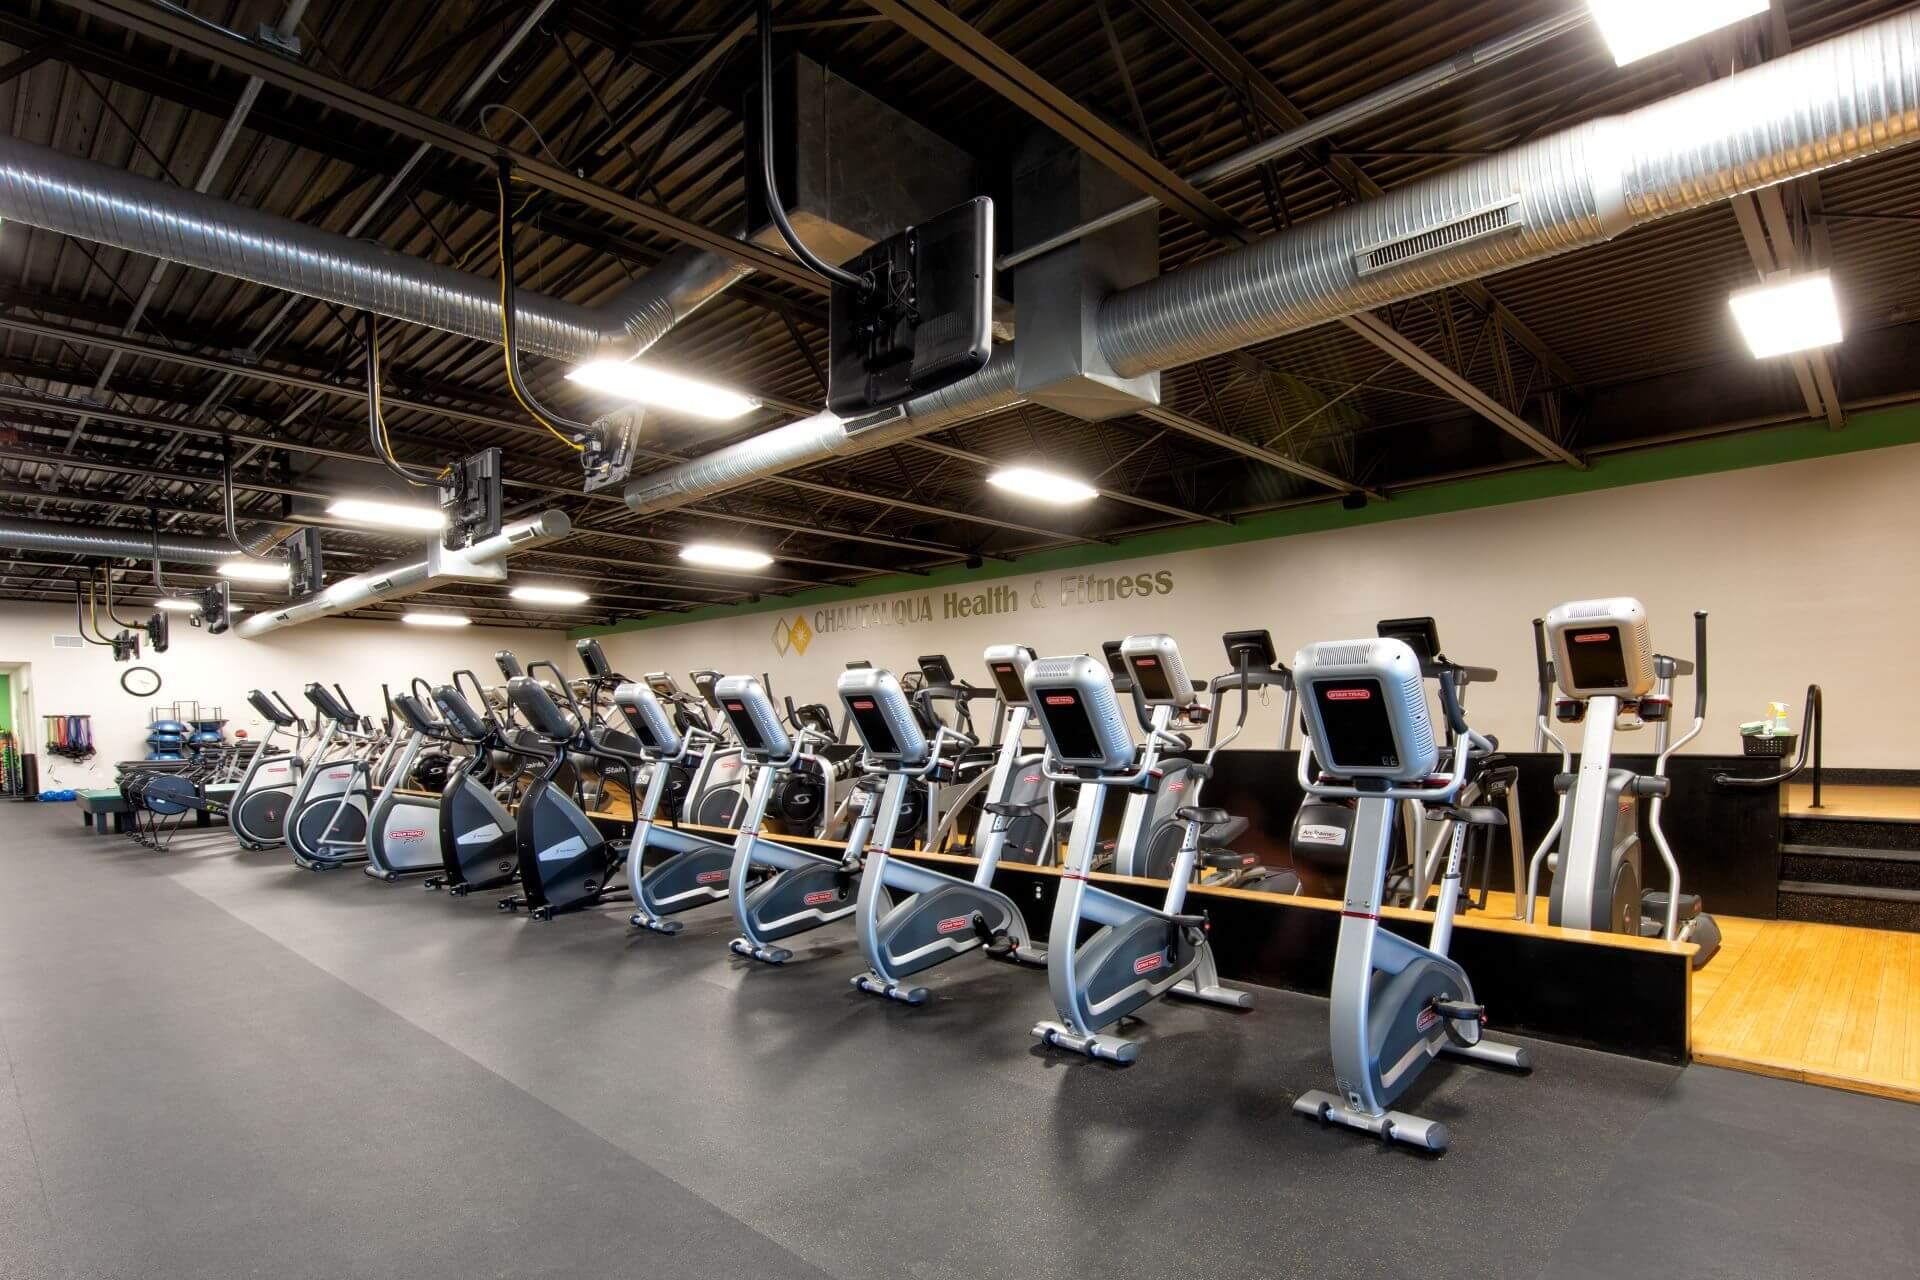 Chautauqua Health Fitness Dunkirk Fredonia S 1 Gym